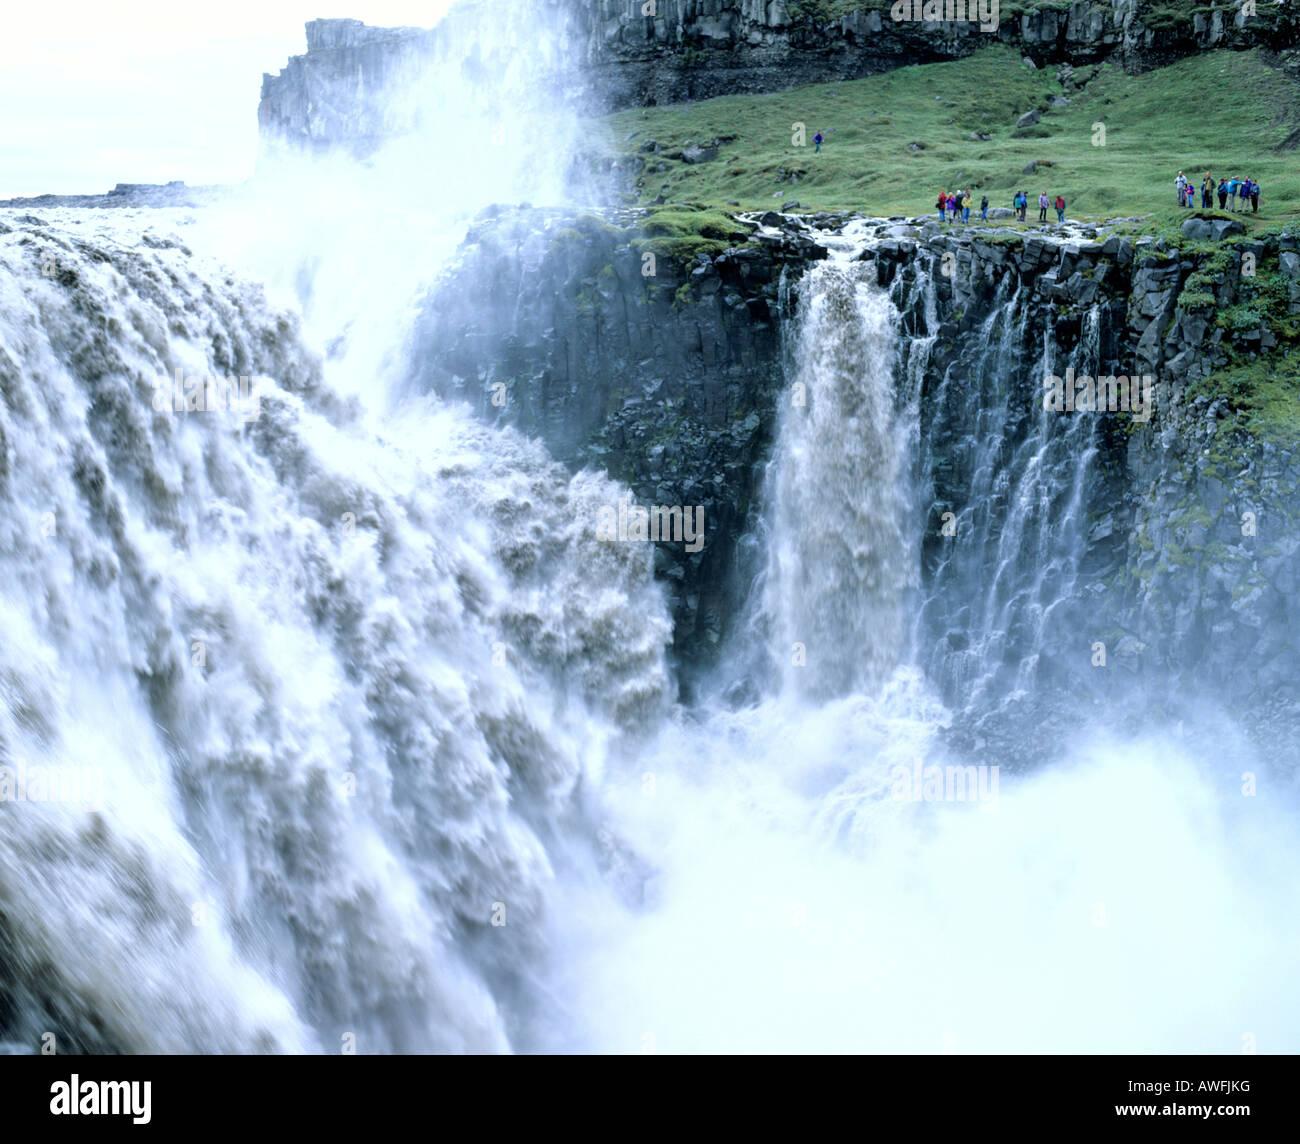 Godafoss Waterfall, Skjálfandafljót-Fluss, Thingeyjarsveit, Thingeyjarsysla, Iceland - Stock Image